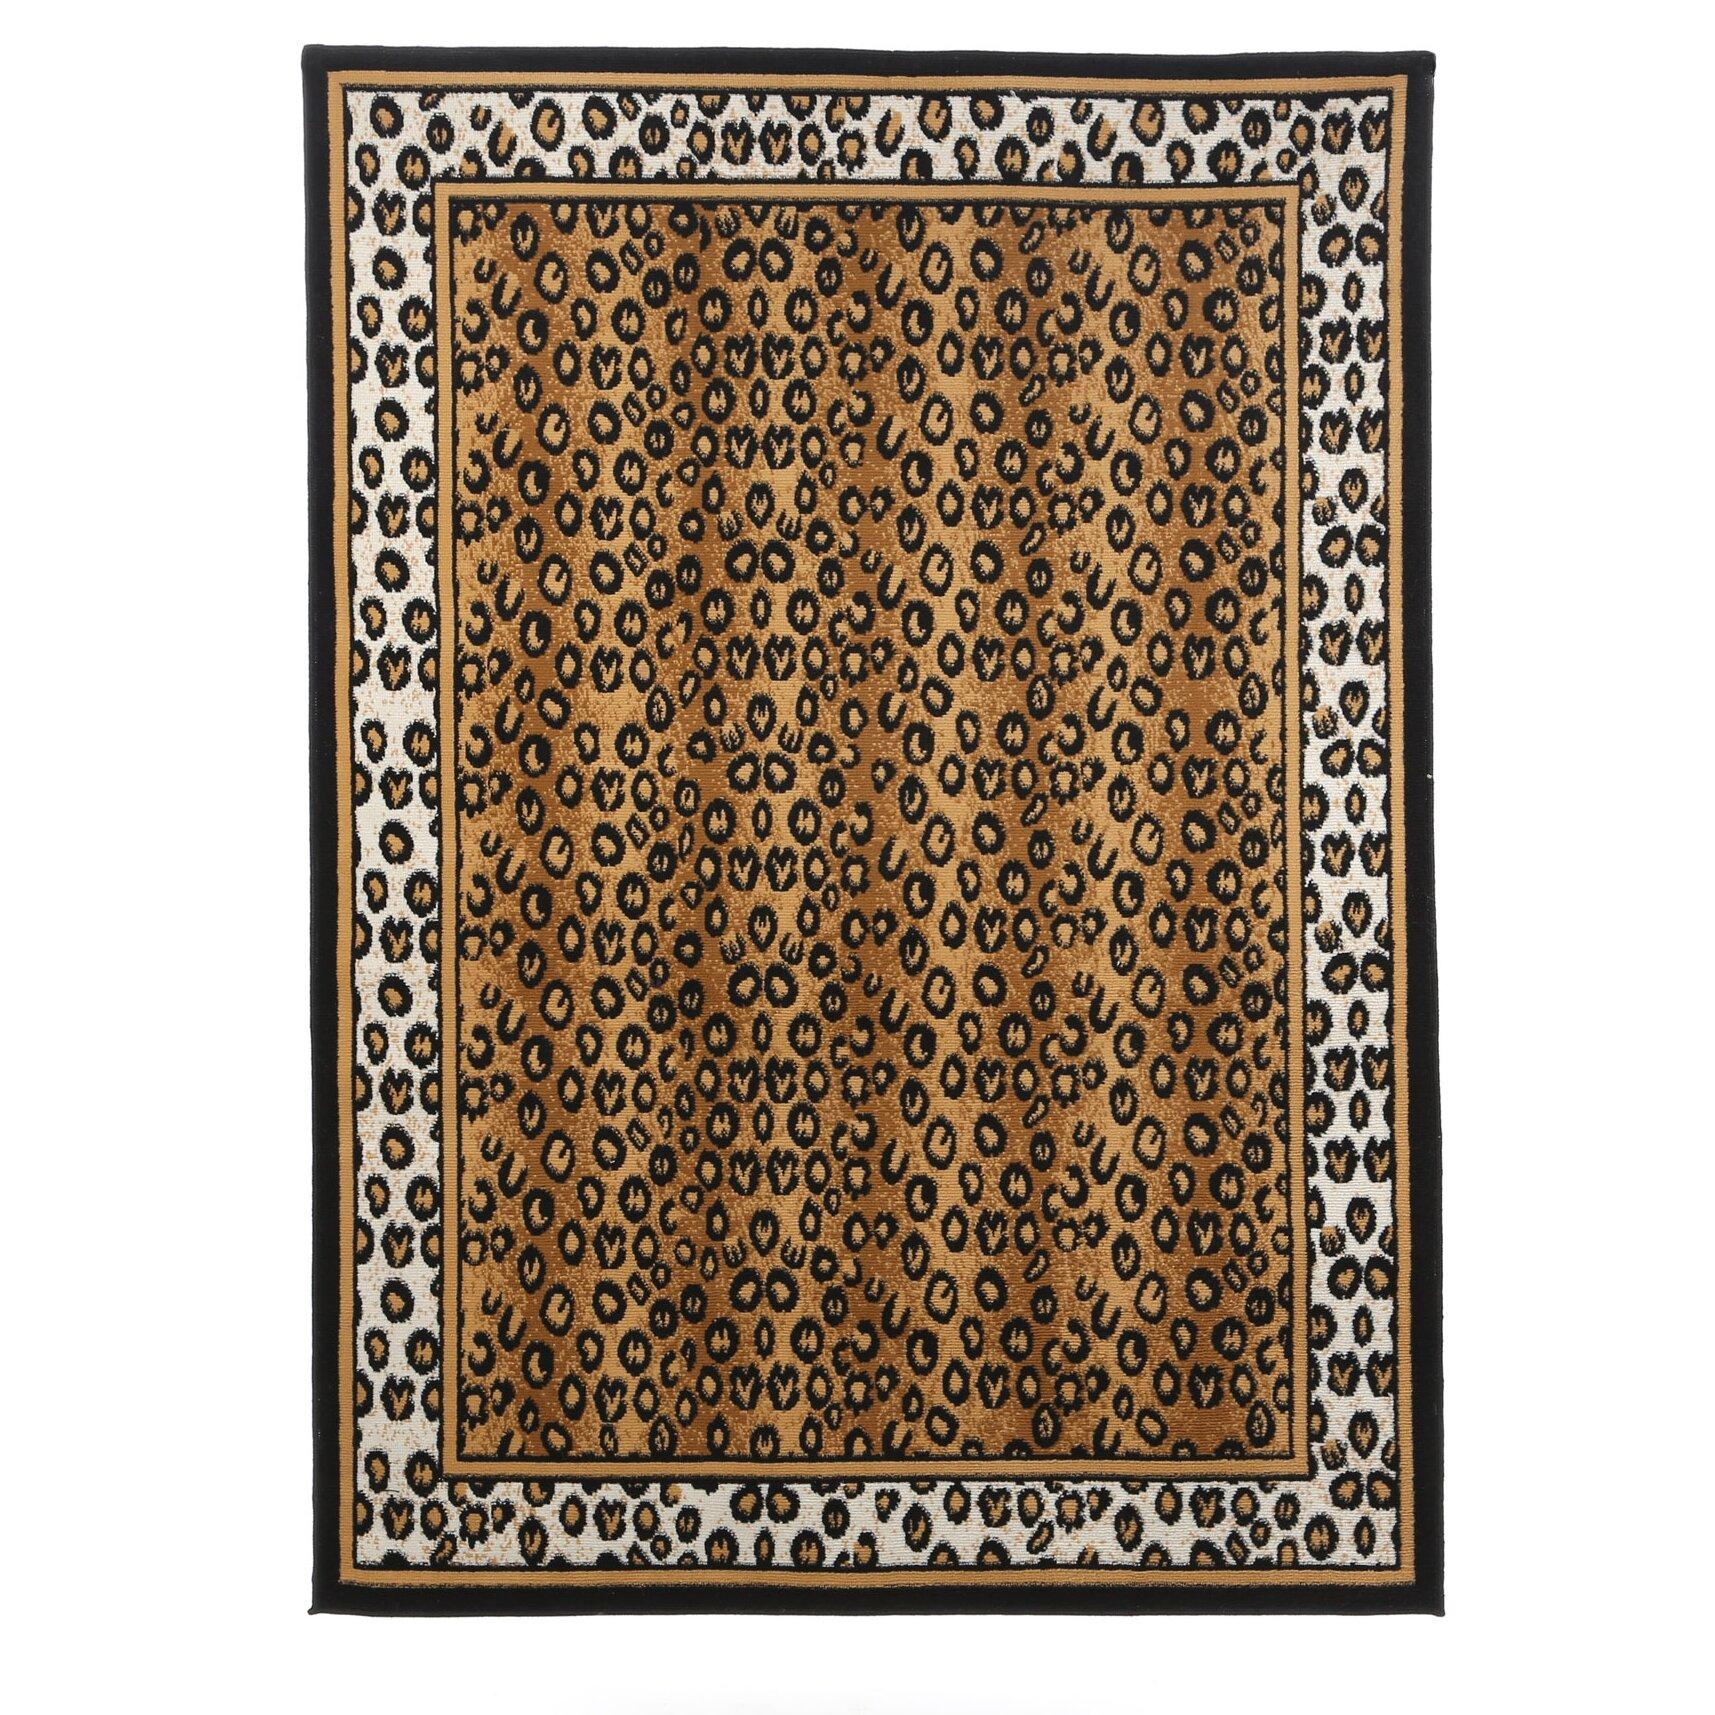 Animal Print Rug Wayfair: Home Dynamix Zone Leopard Brown Area Rug & Reviews